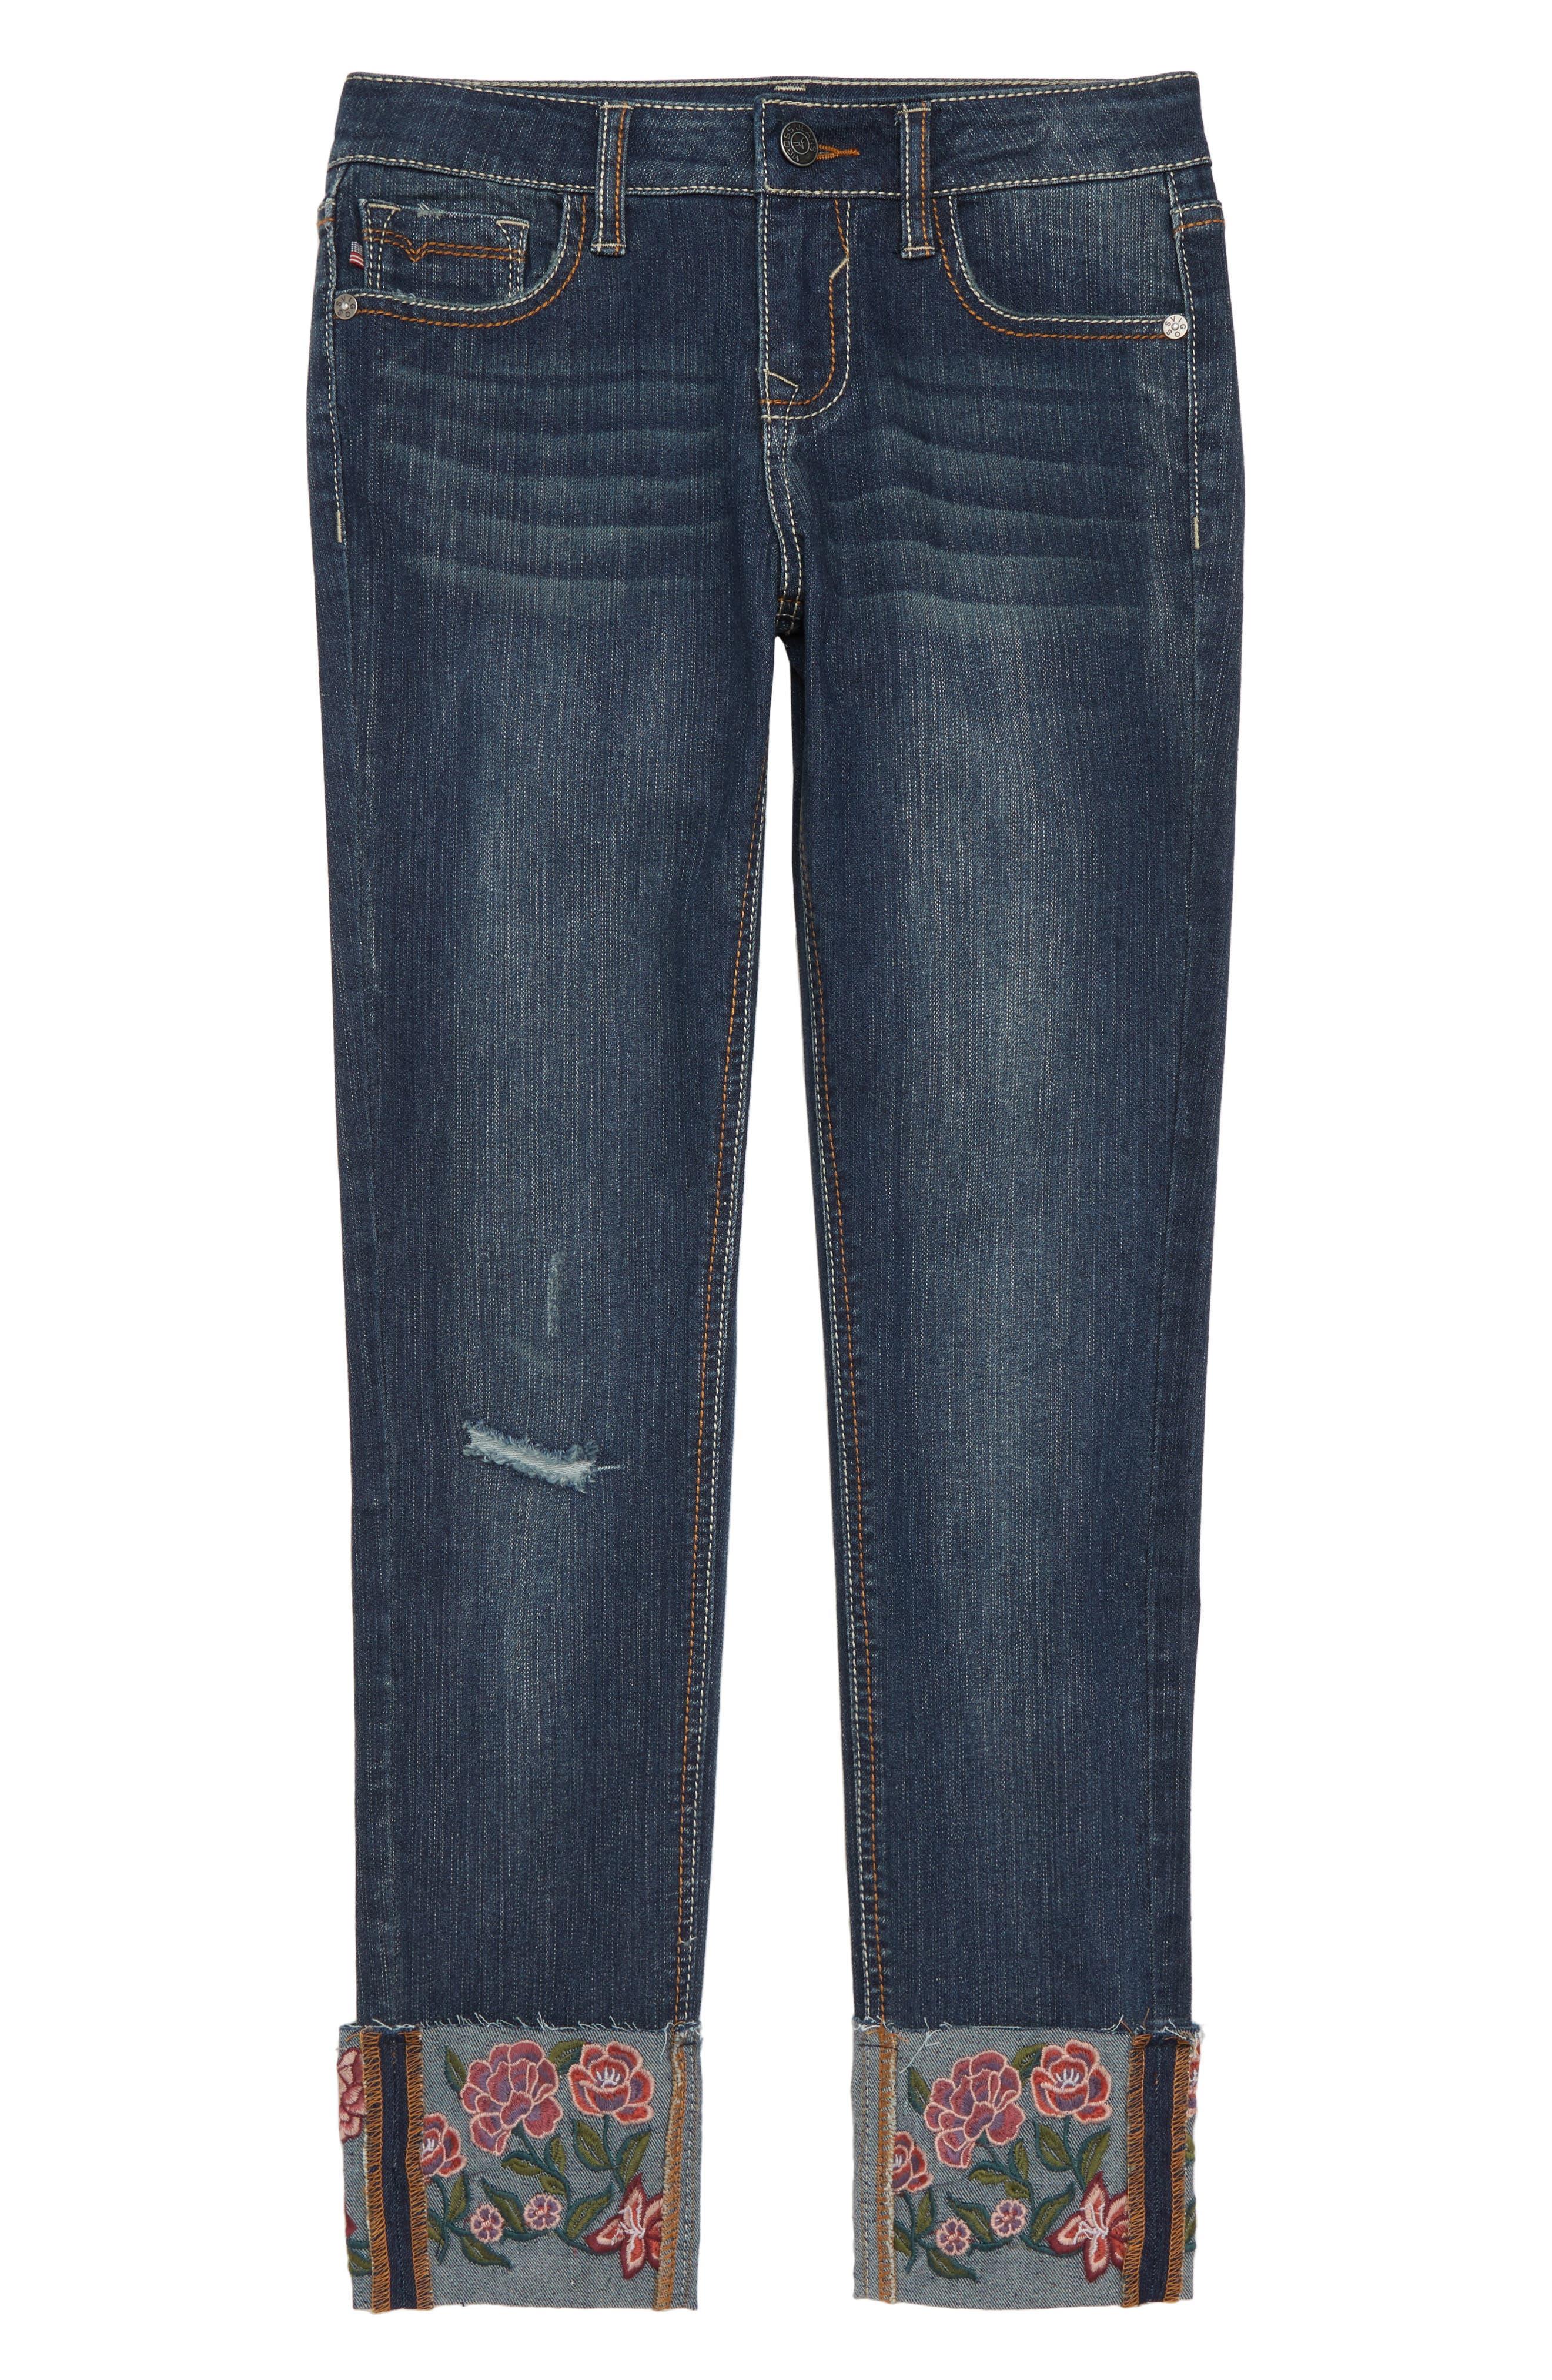 Embroidered Cuff Jeans,                         Main,                         color, DARK MIDNIGHT/ DMN